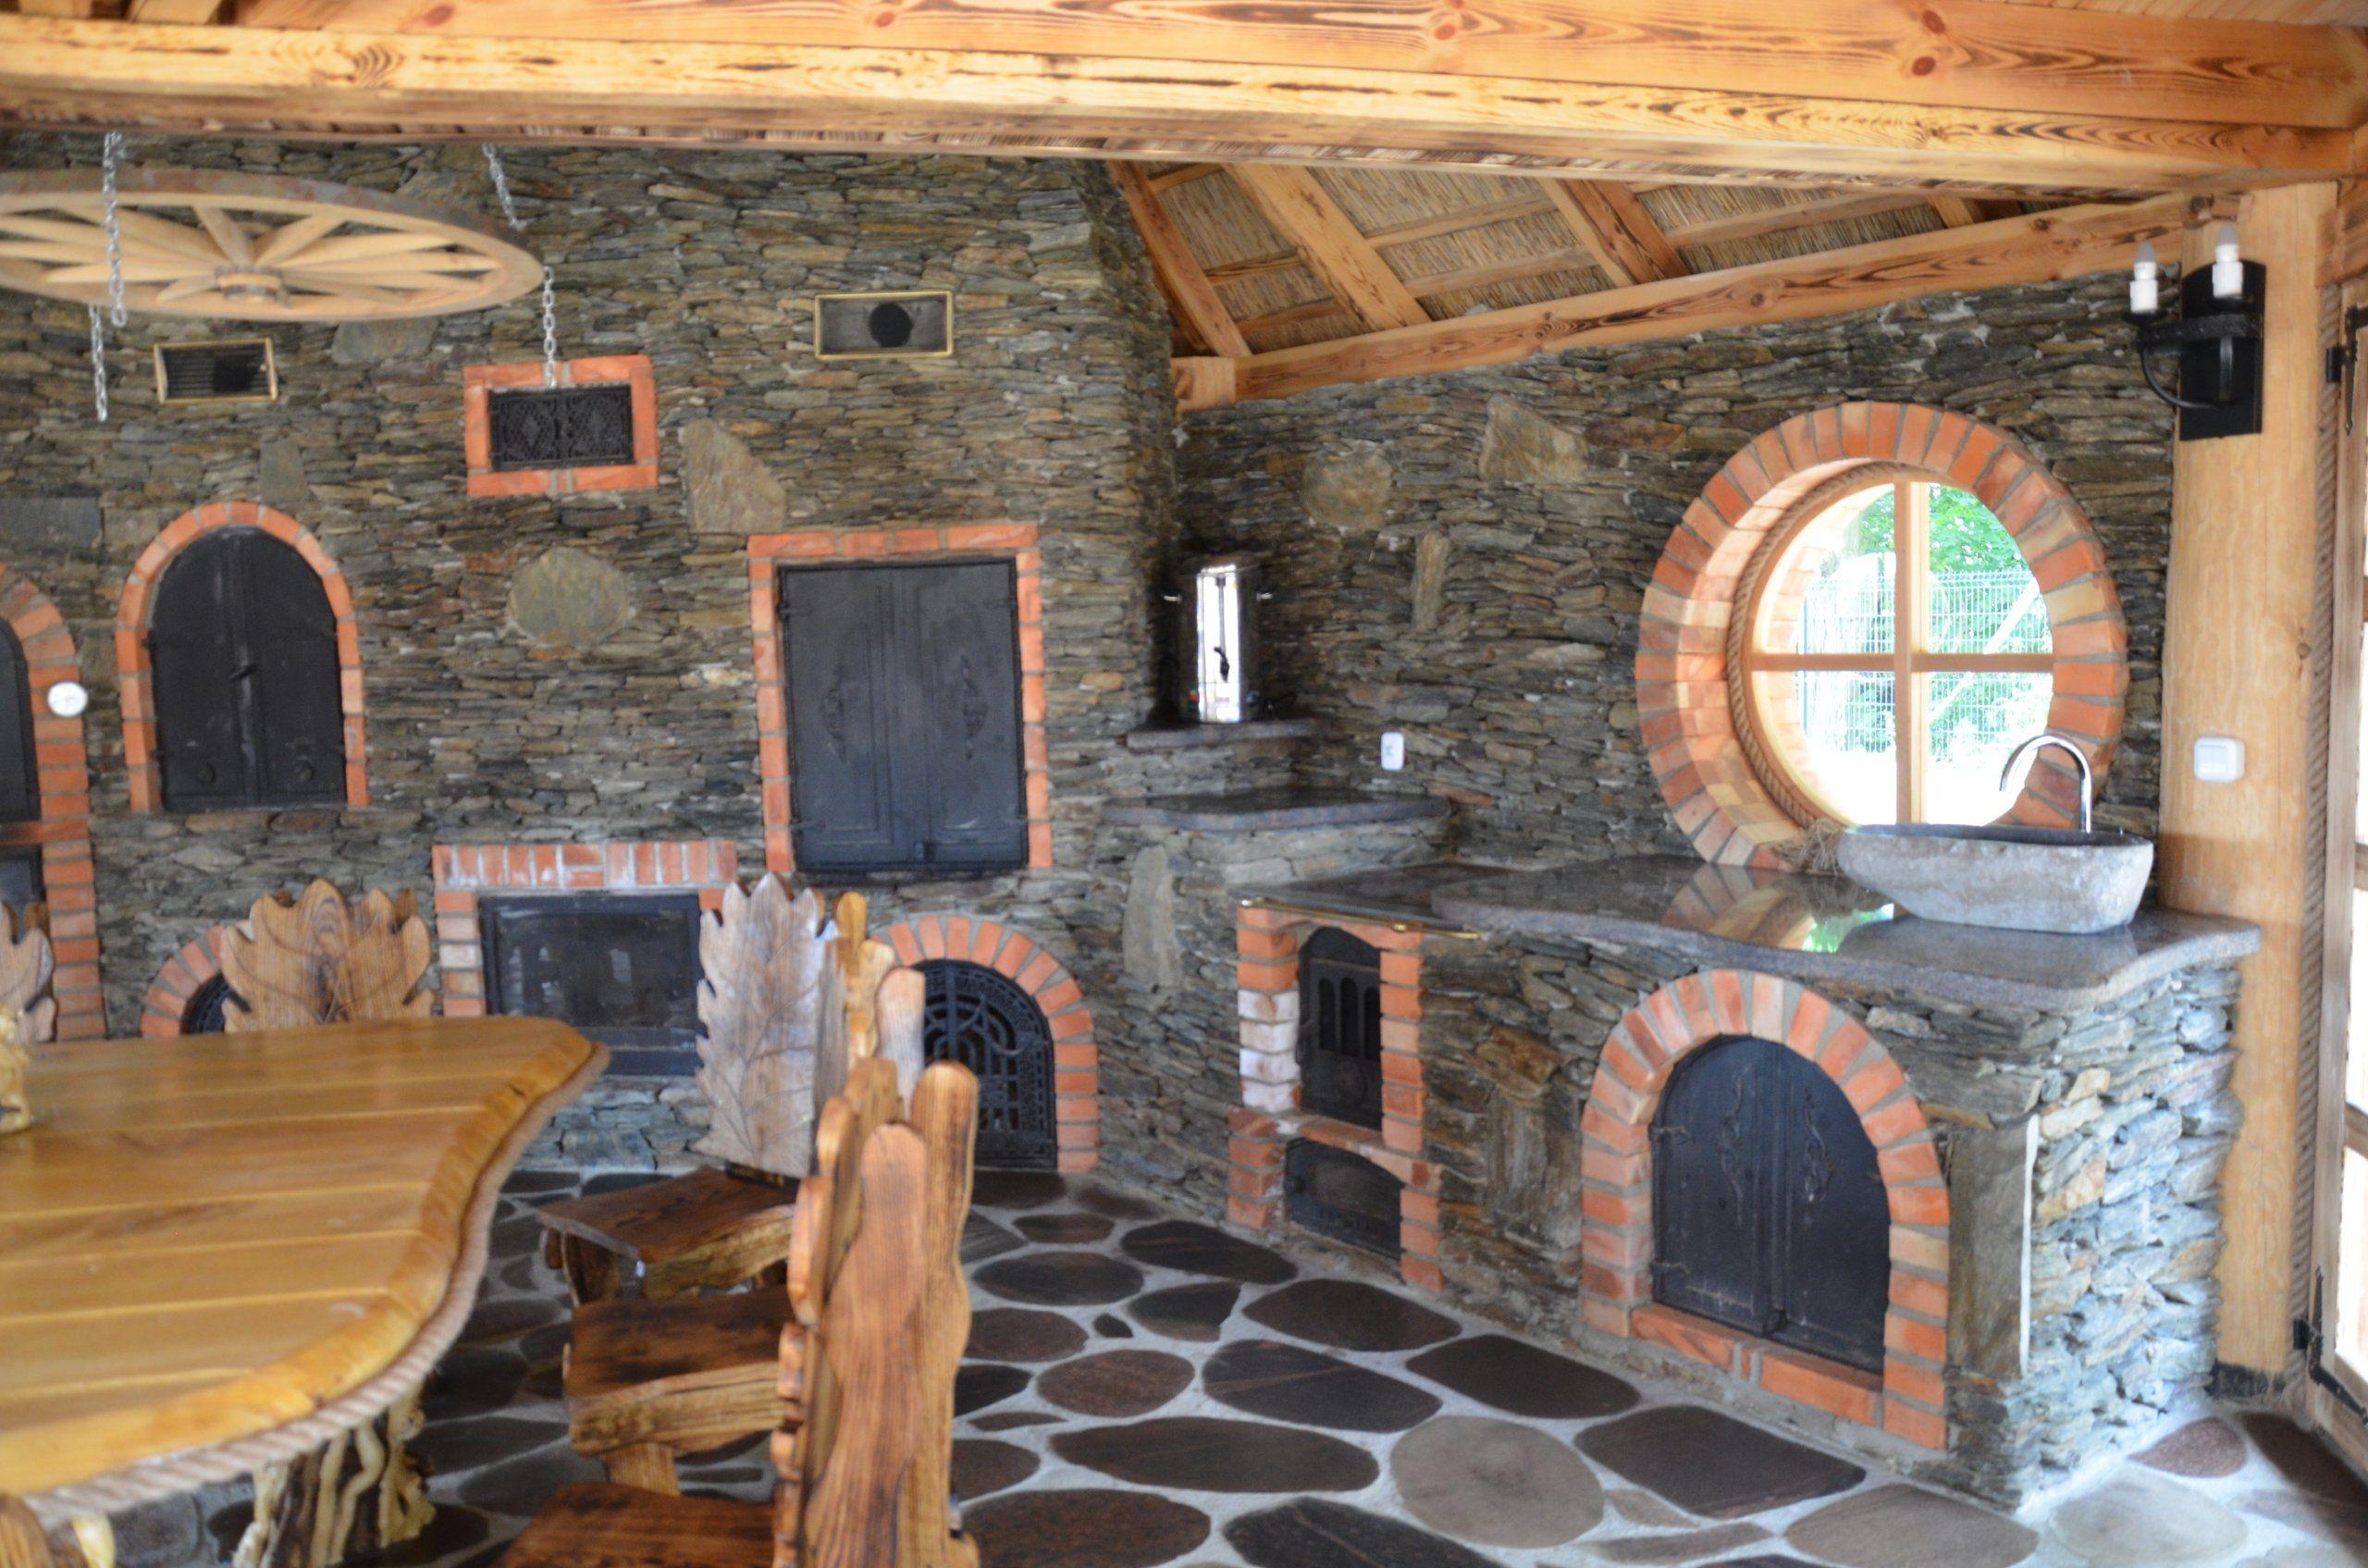 Grill Wedzarnia Murowana Altana Piec Chlebowy 6677953641 Oficjalne Archiwum Allegro Outdoor Kitchen Woodworking Kitchen